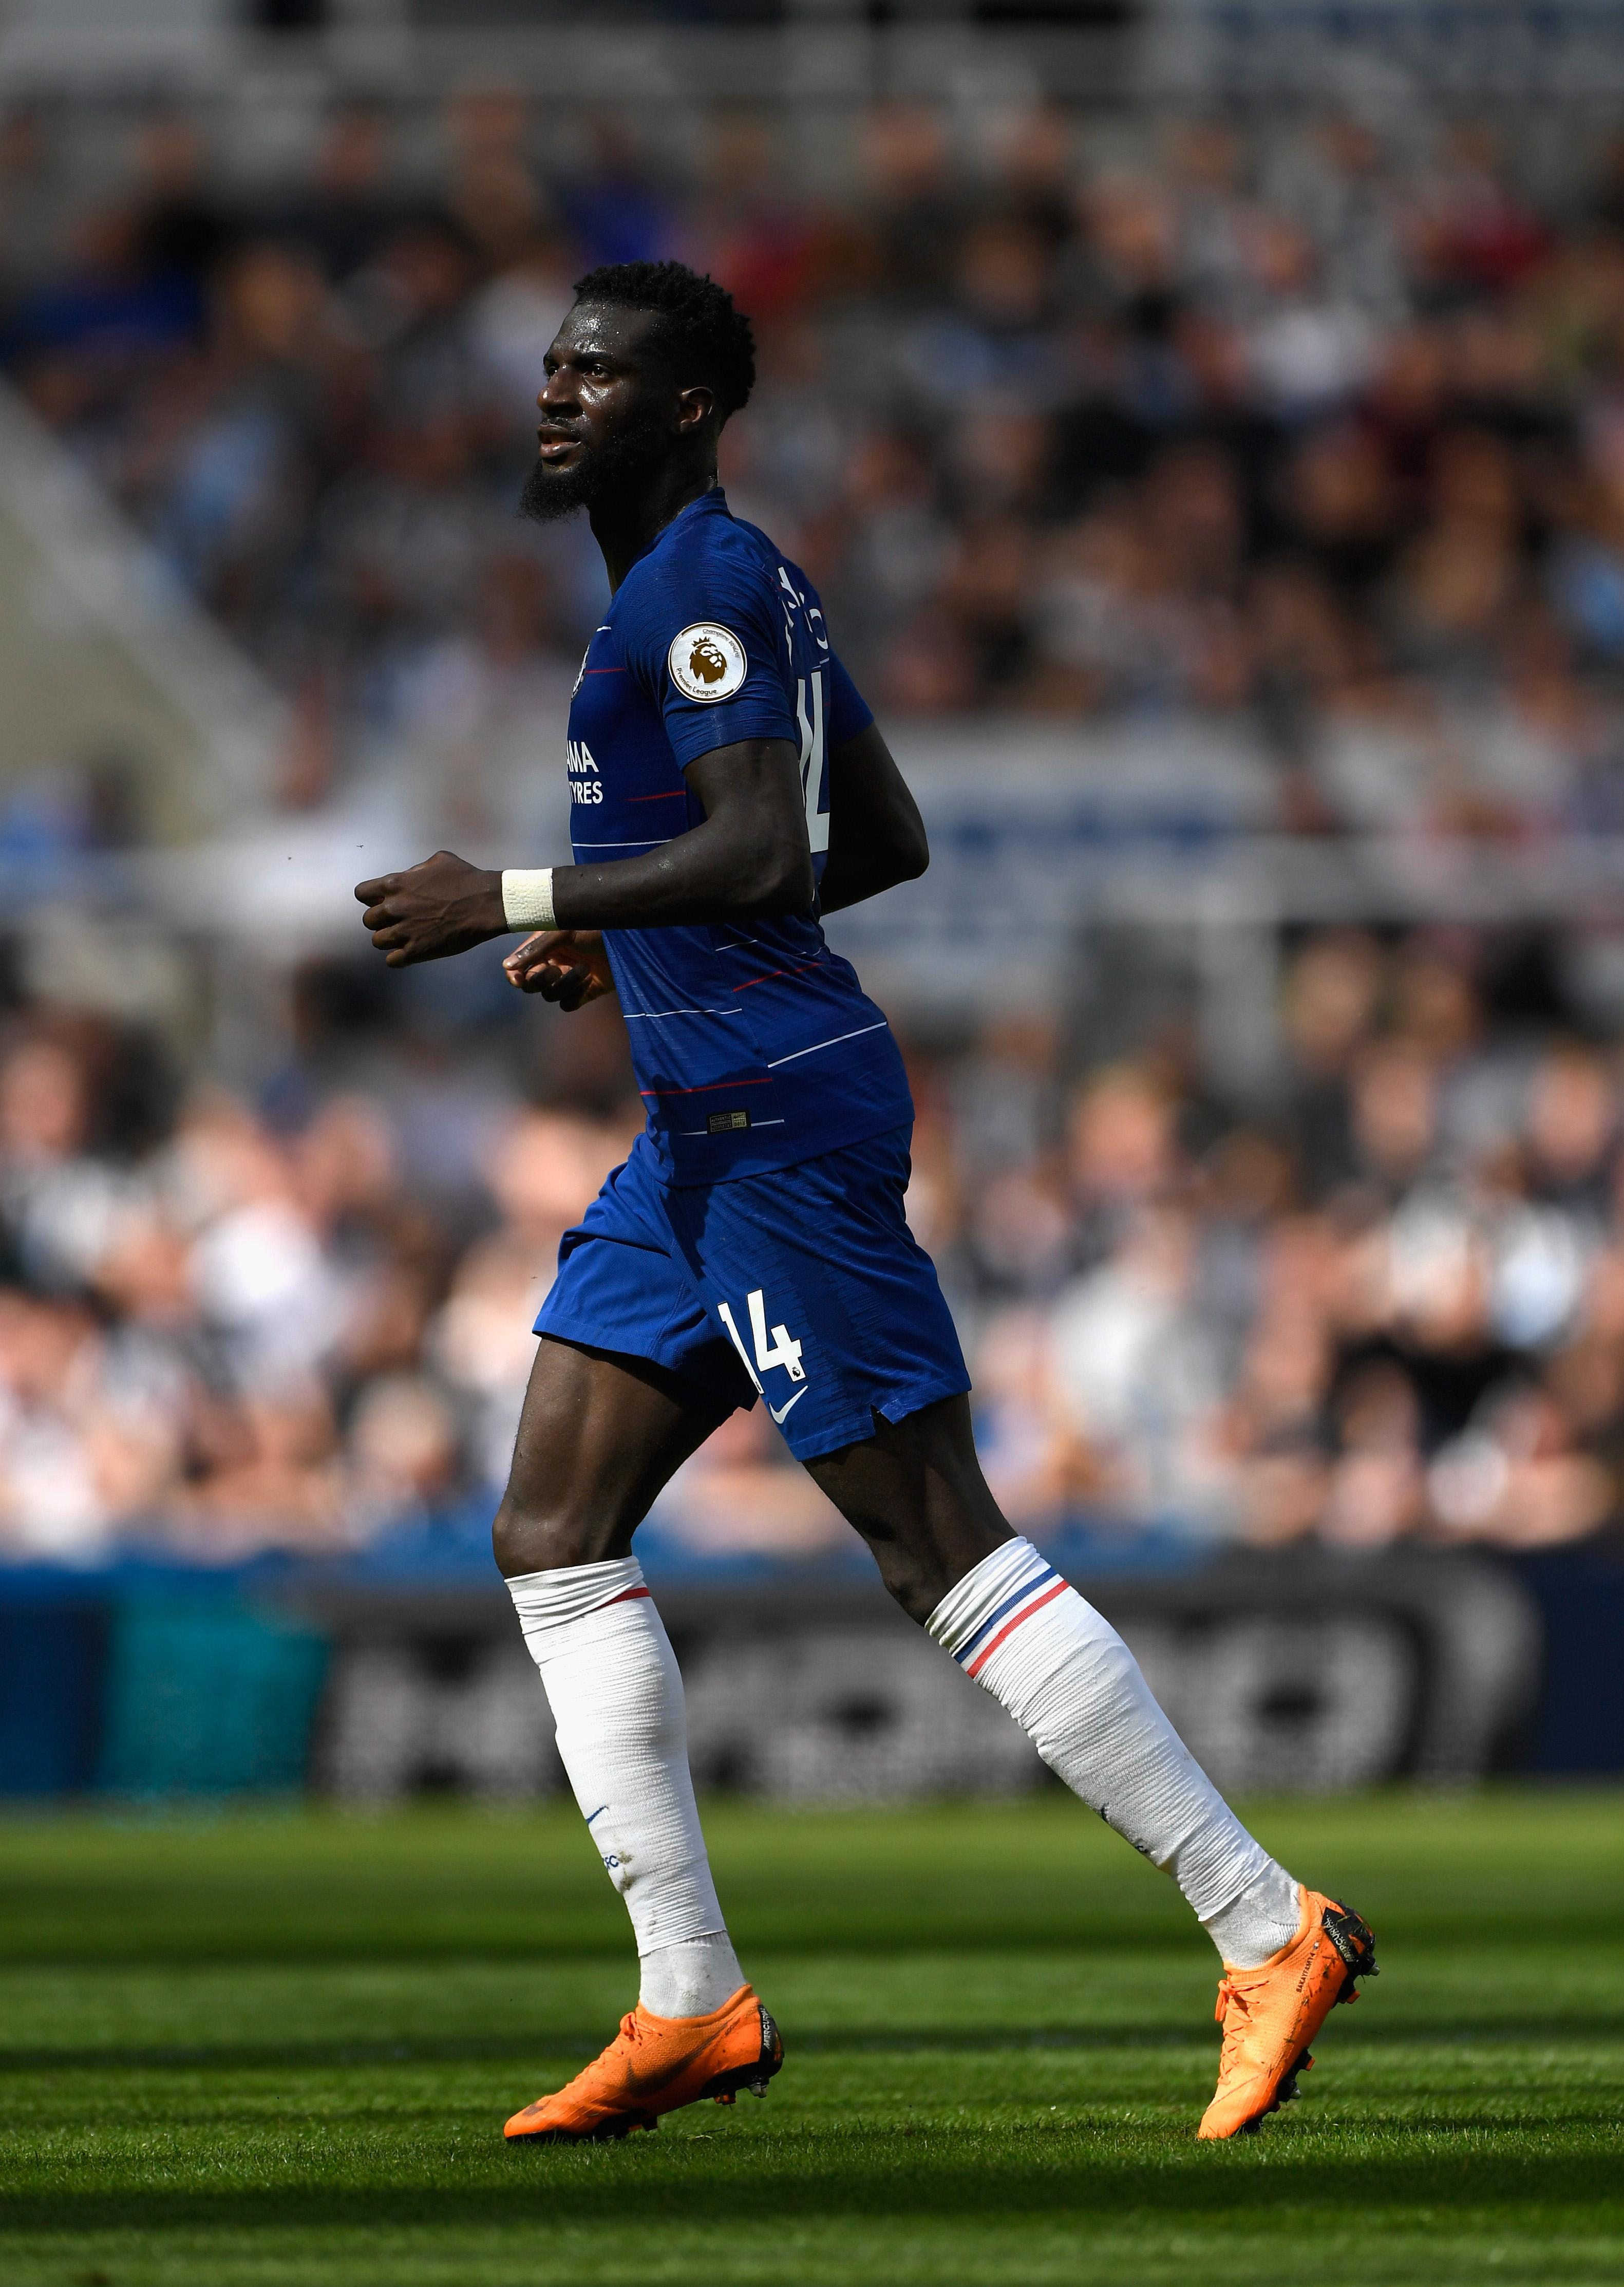 Sevilla want Tiémoué Bakayoko on loan — report